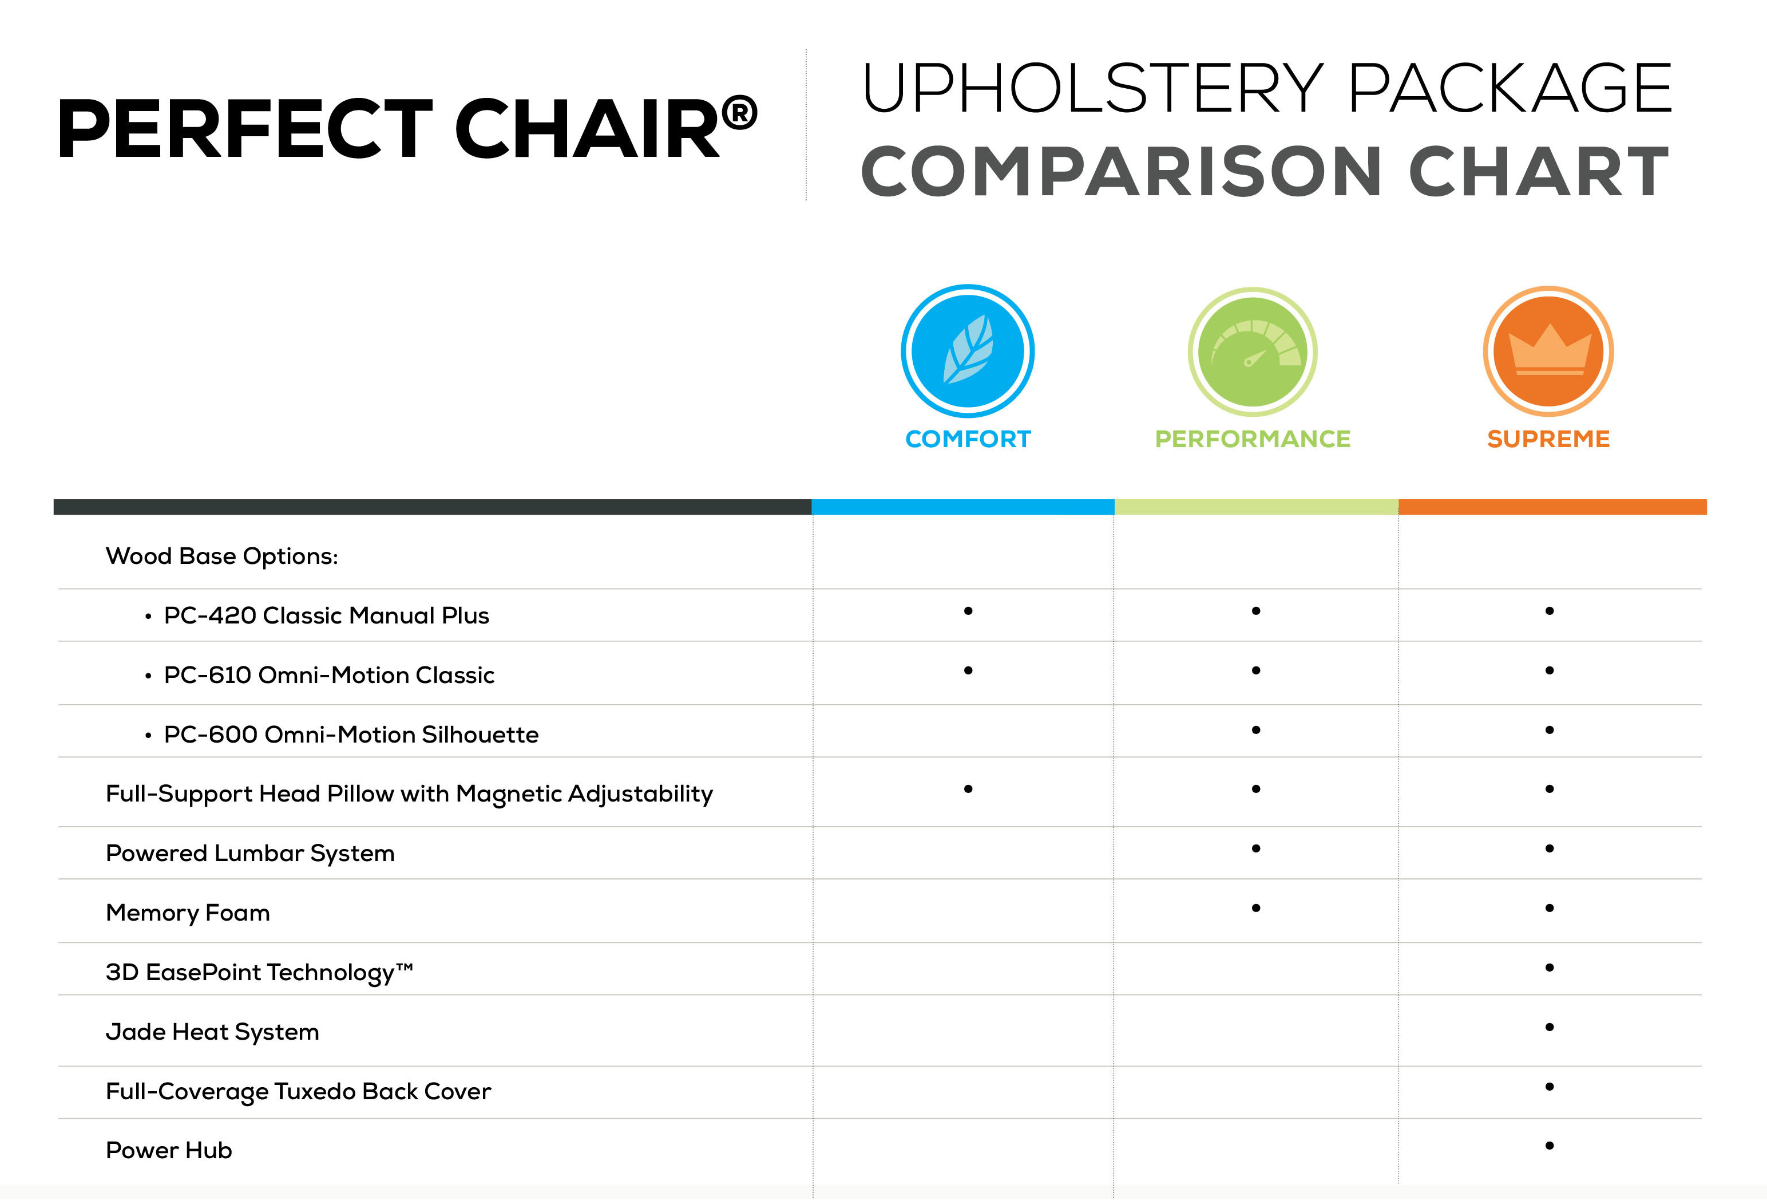 Perfect Chair Comparison Chart